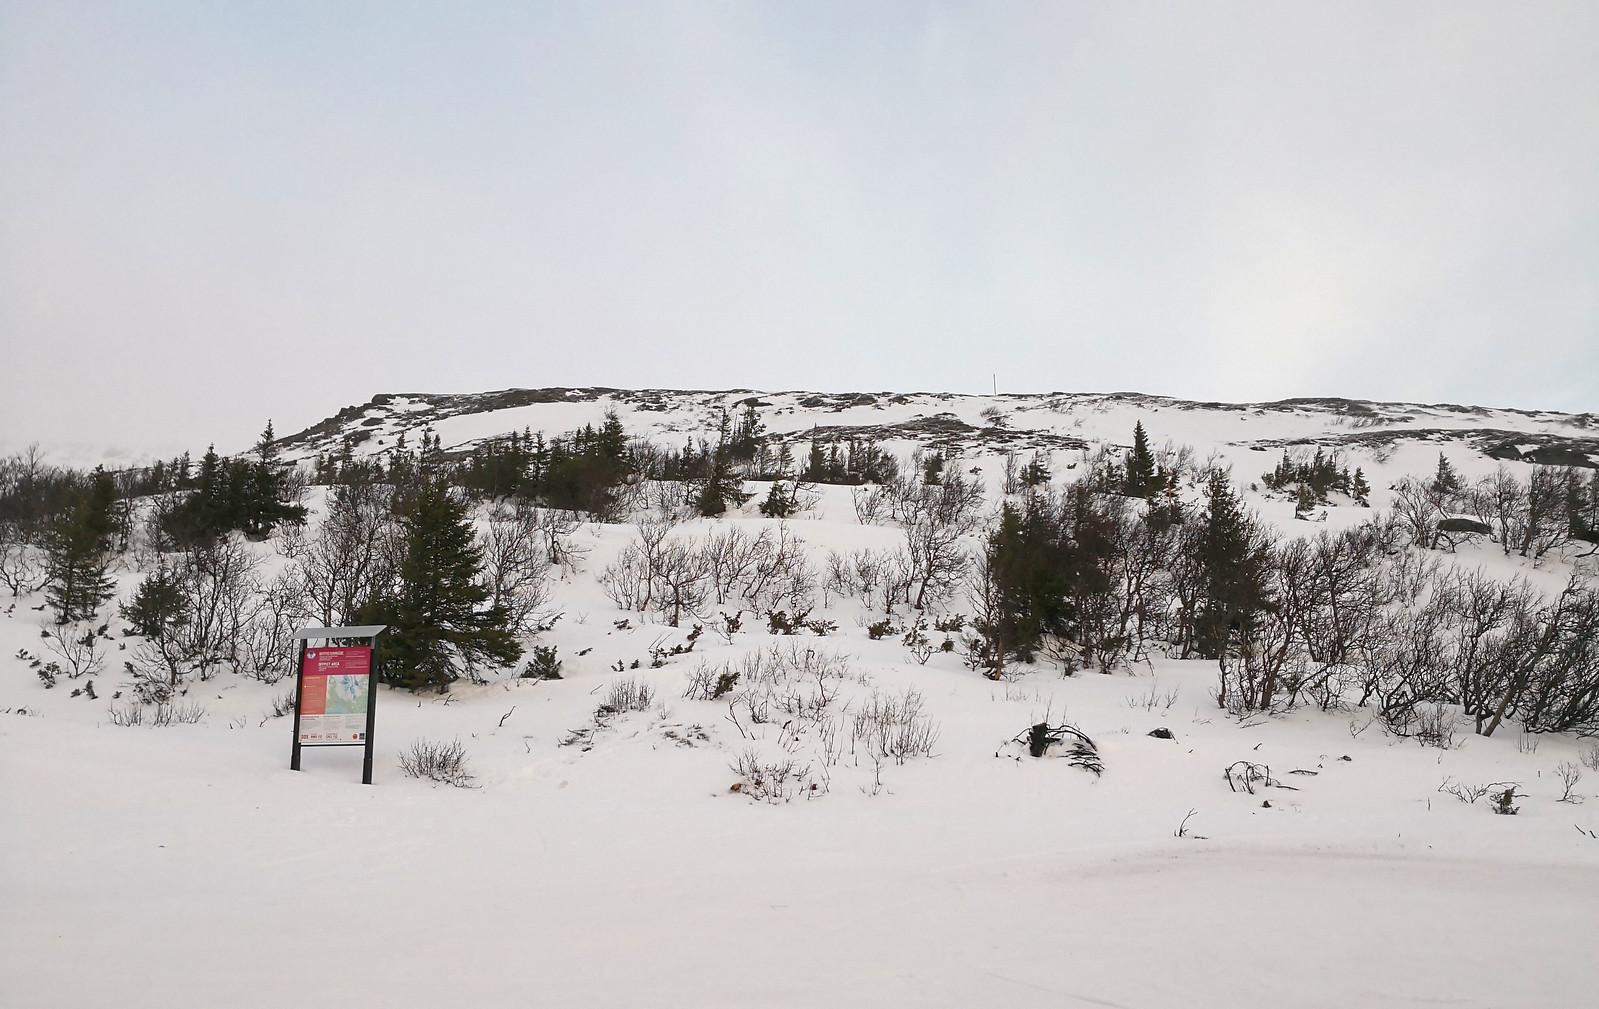 At the top of Fjällgårdsexpressen